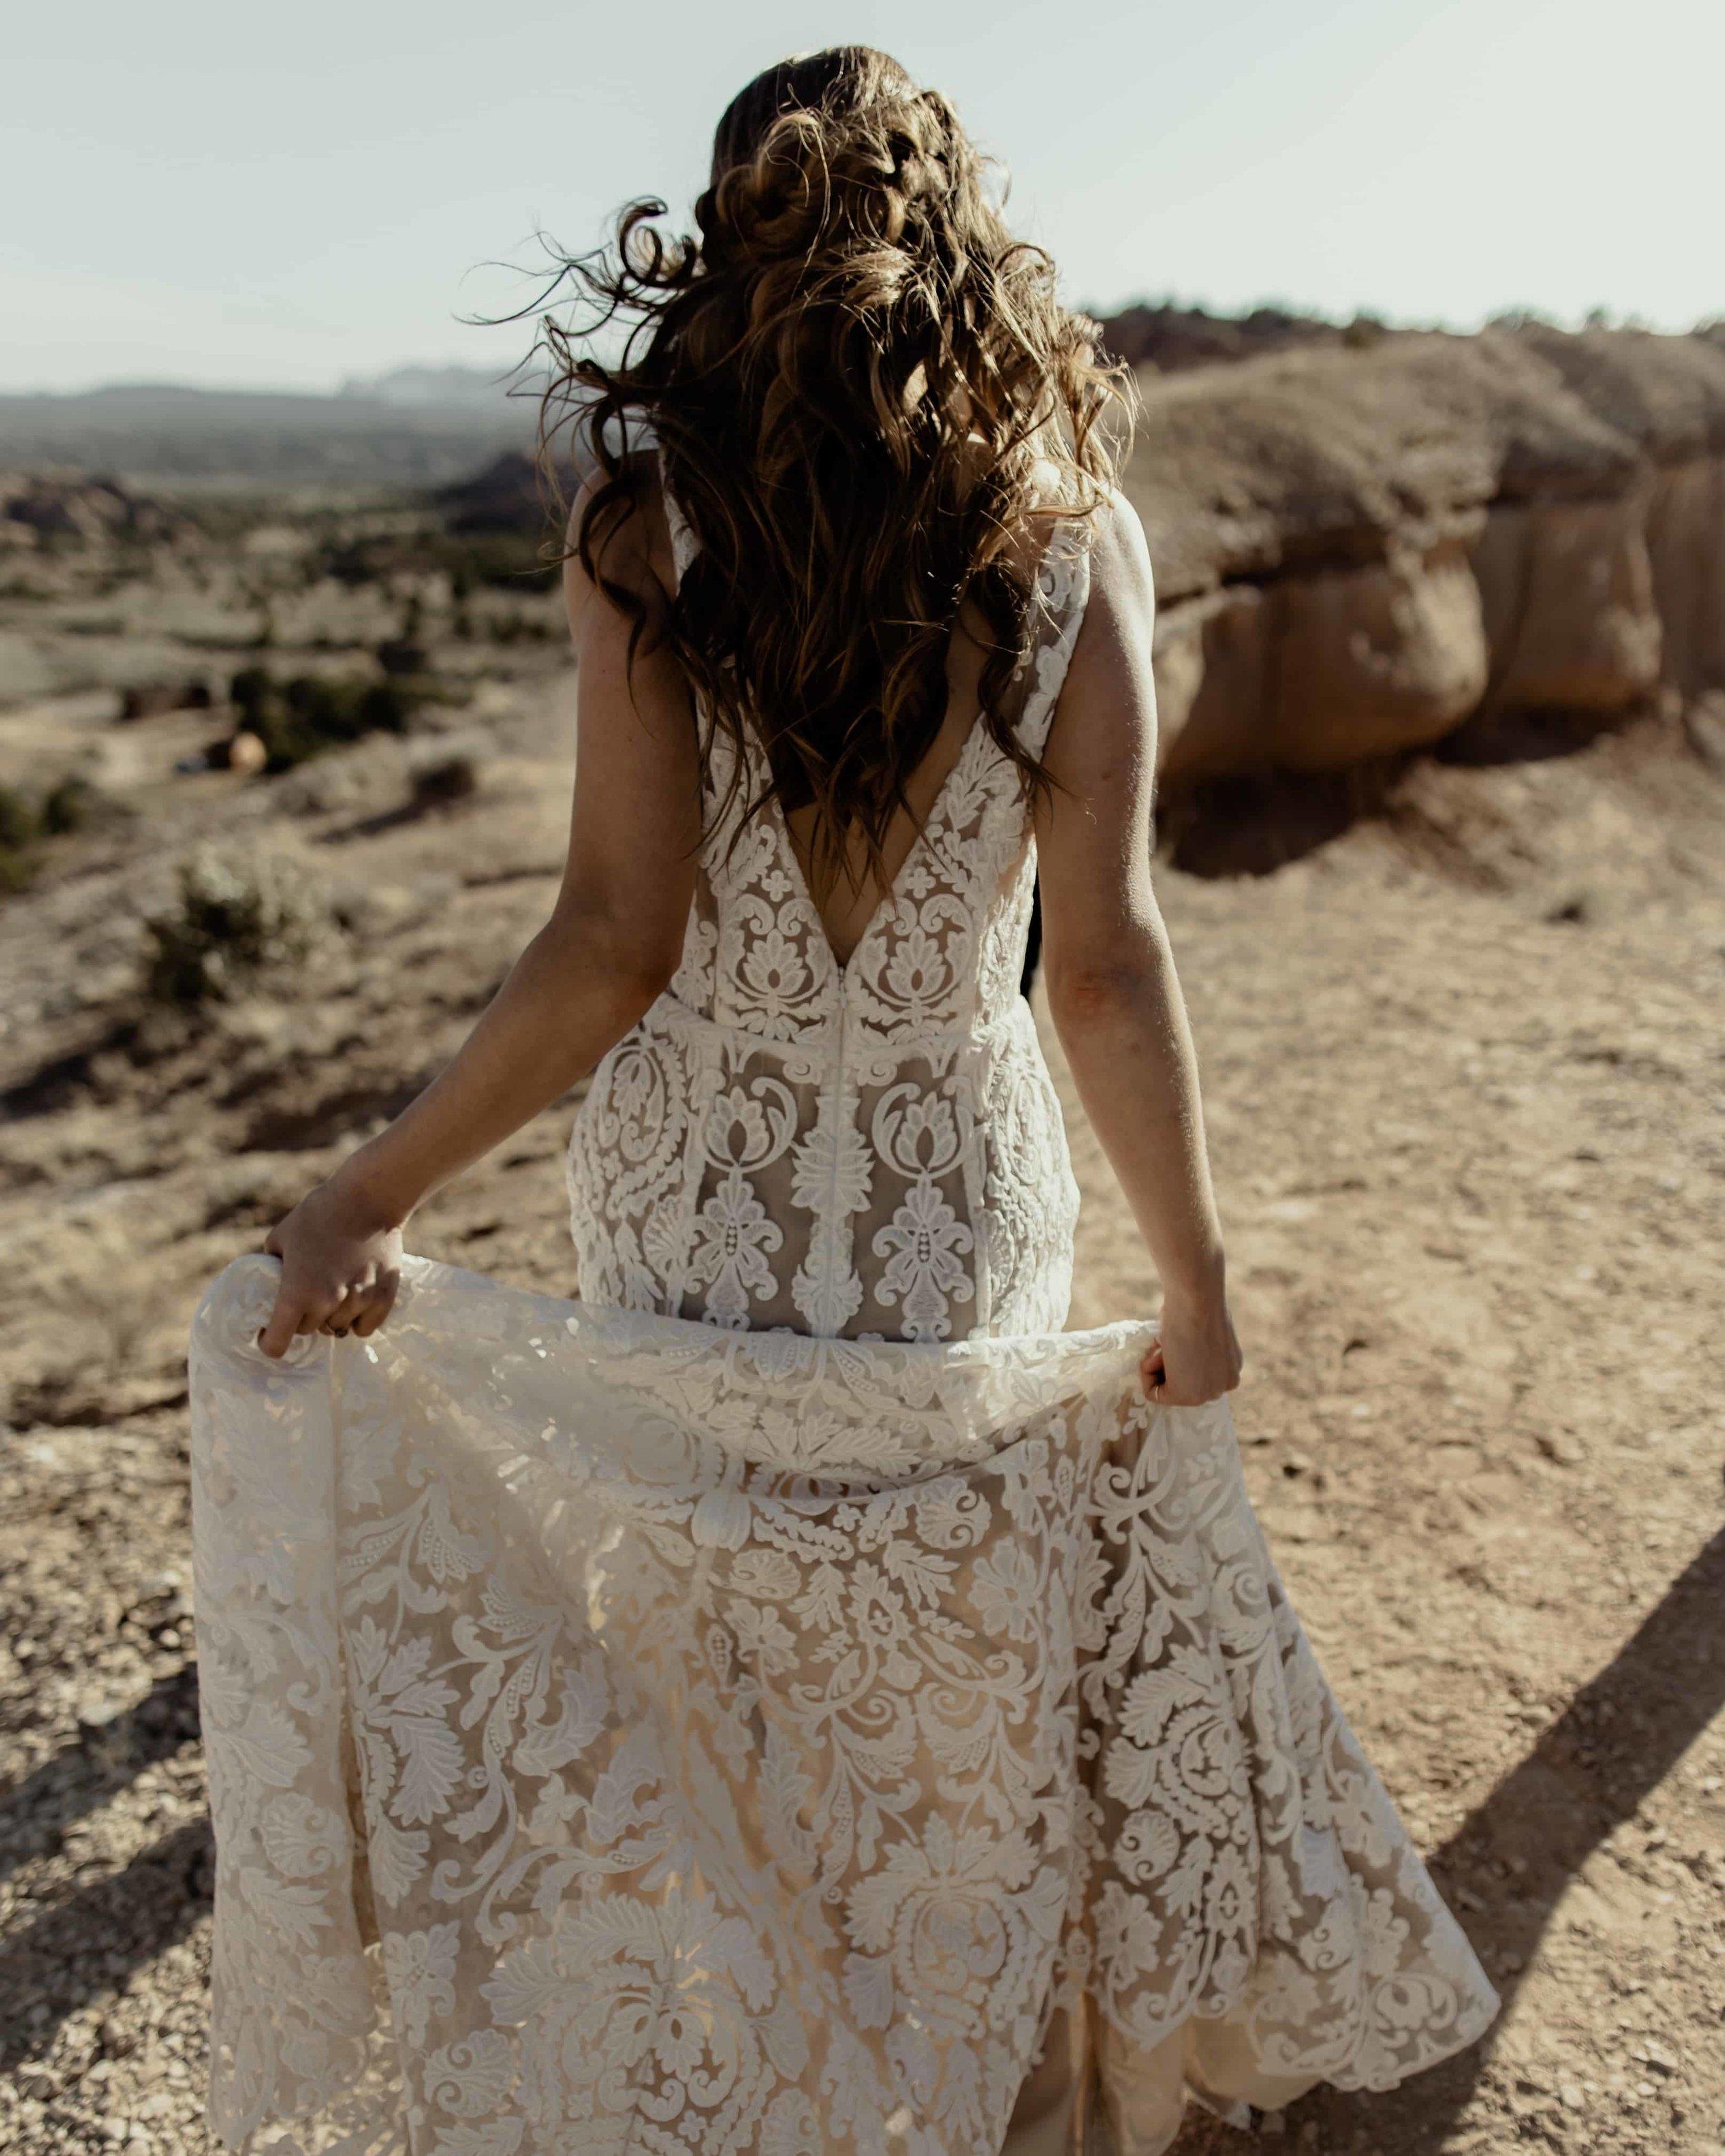 bride walks away holding her dress as she walks through the dirt in the desert